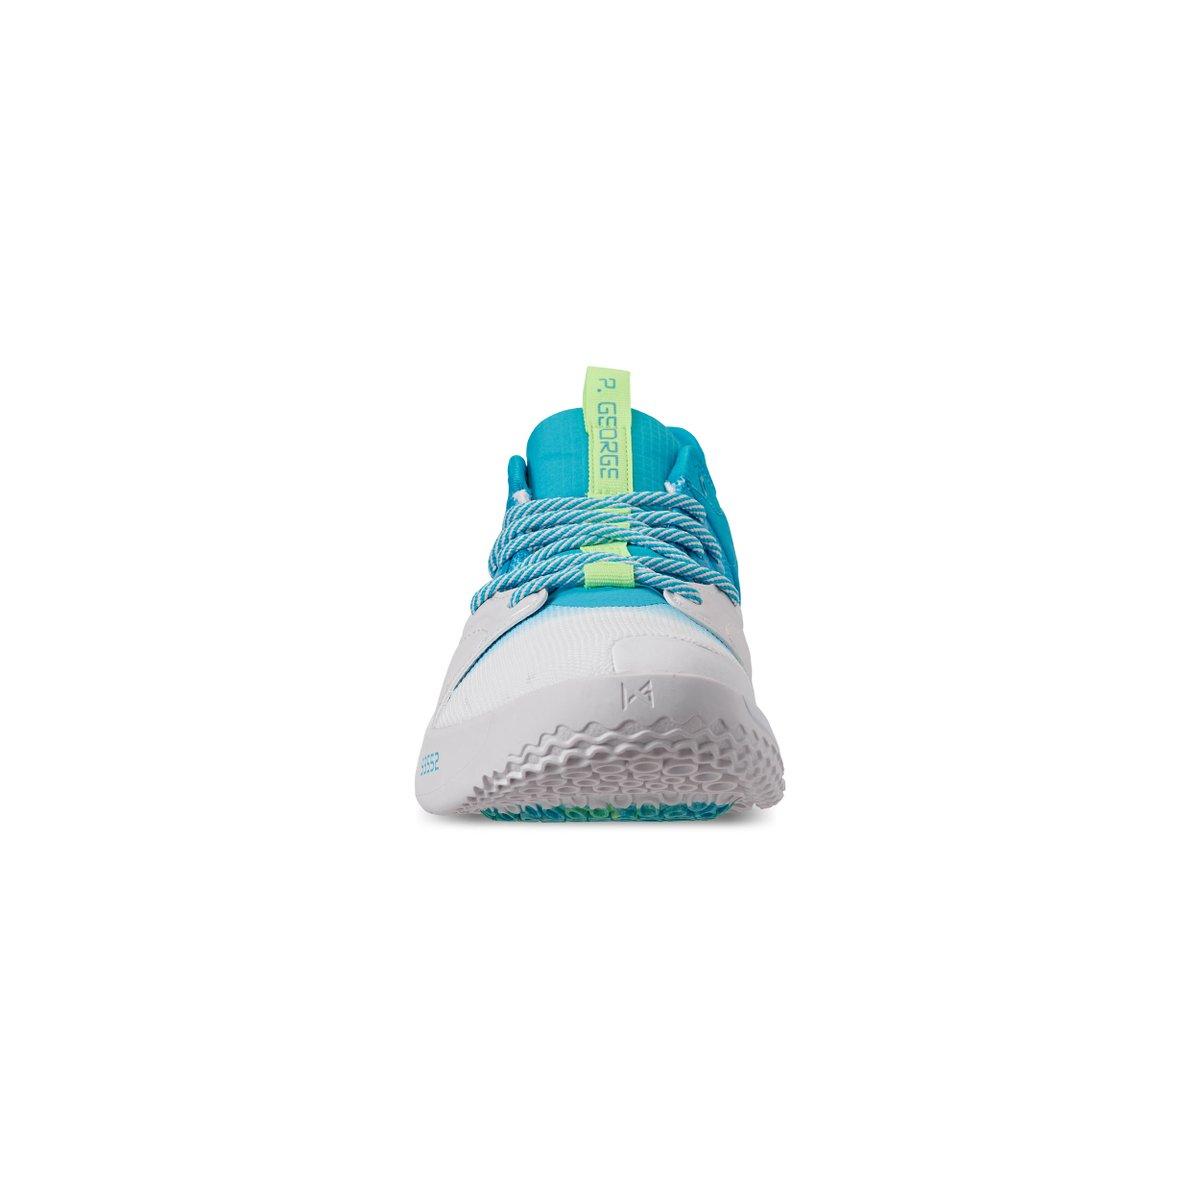 "Nike PG3 ""Lure"",潮鞋-莆田鞋-精仿鞋-高仿鞋"